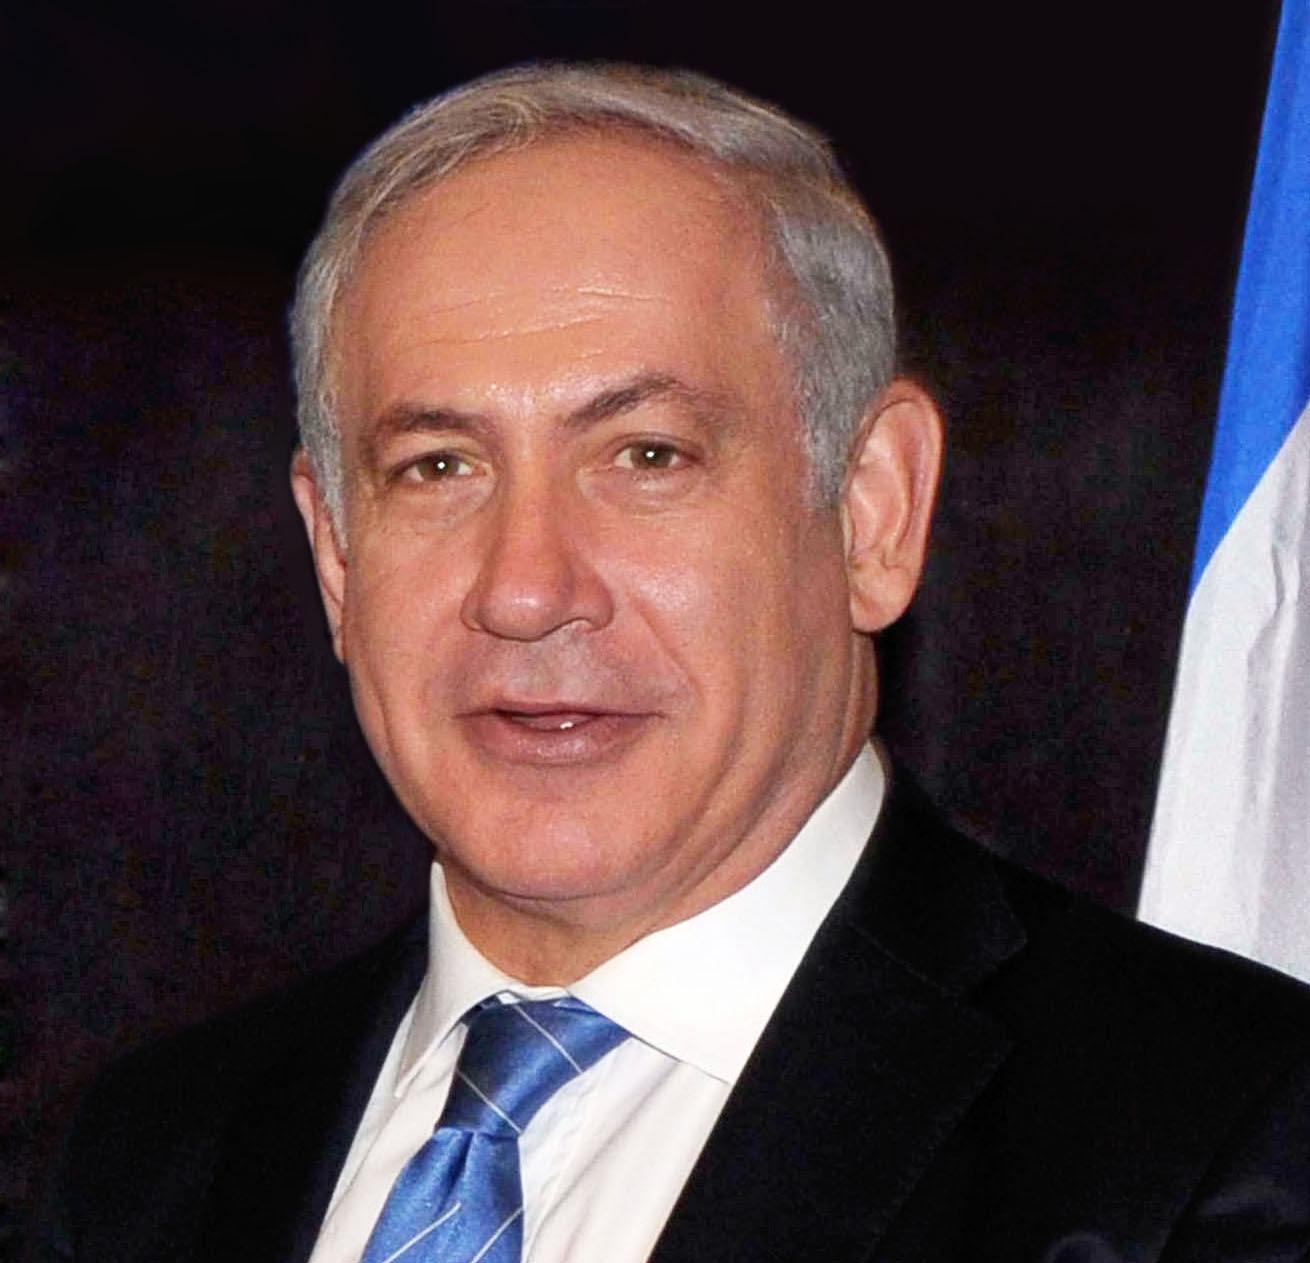 http://upload.wikimedia.org/wikipedia/commons/1/1e/Benjamin_Netanyahu_portrait.jpg